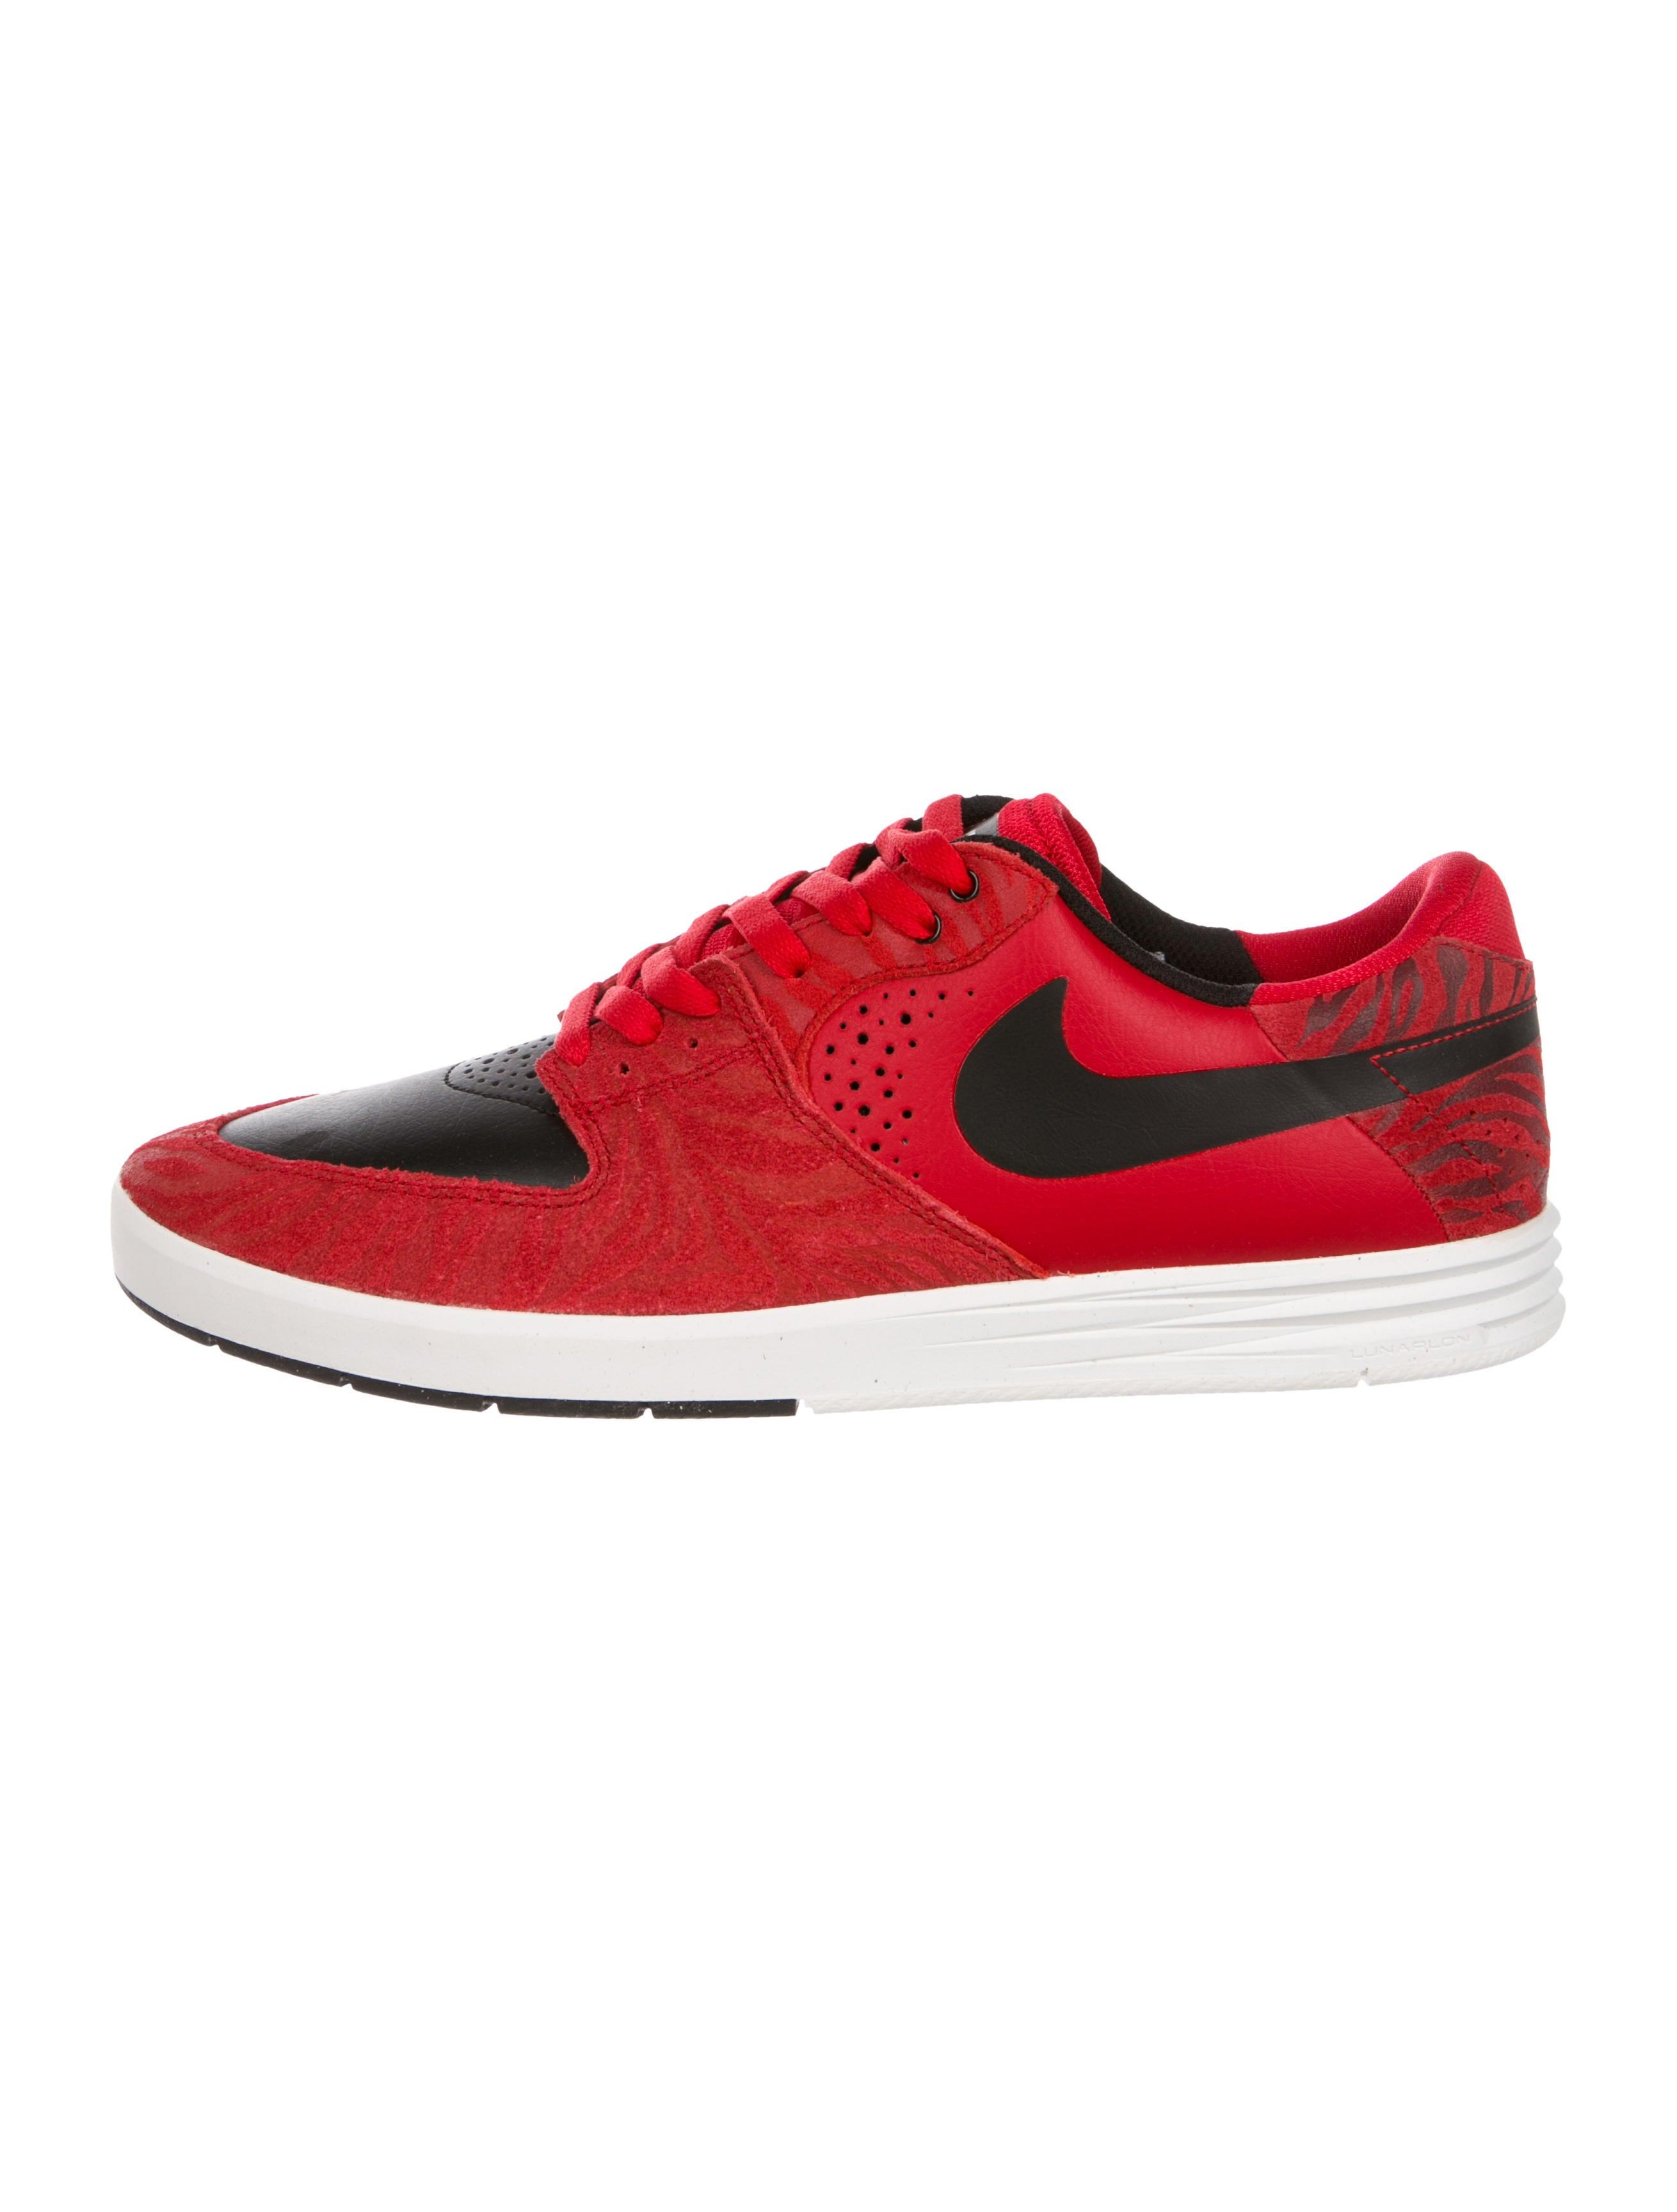 04ce85ebb408 Nike SB Paul Rodriguez 7 Premium Sneakers w  Tags - Shoes - WU228014 ...